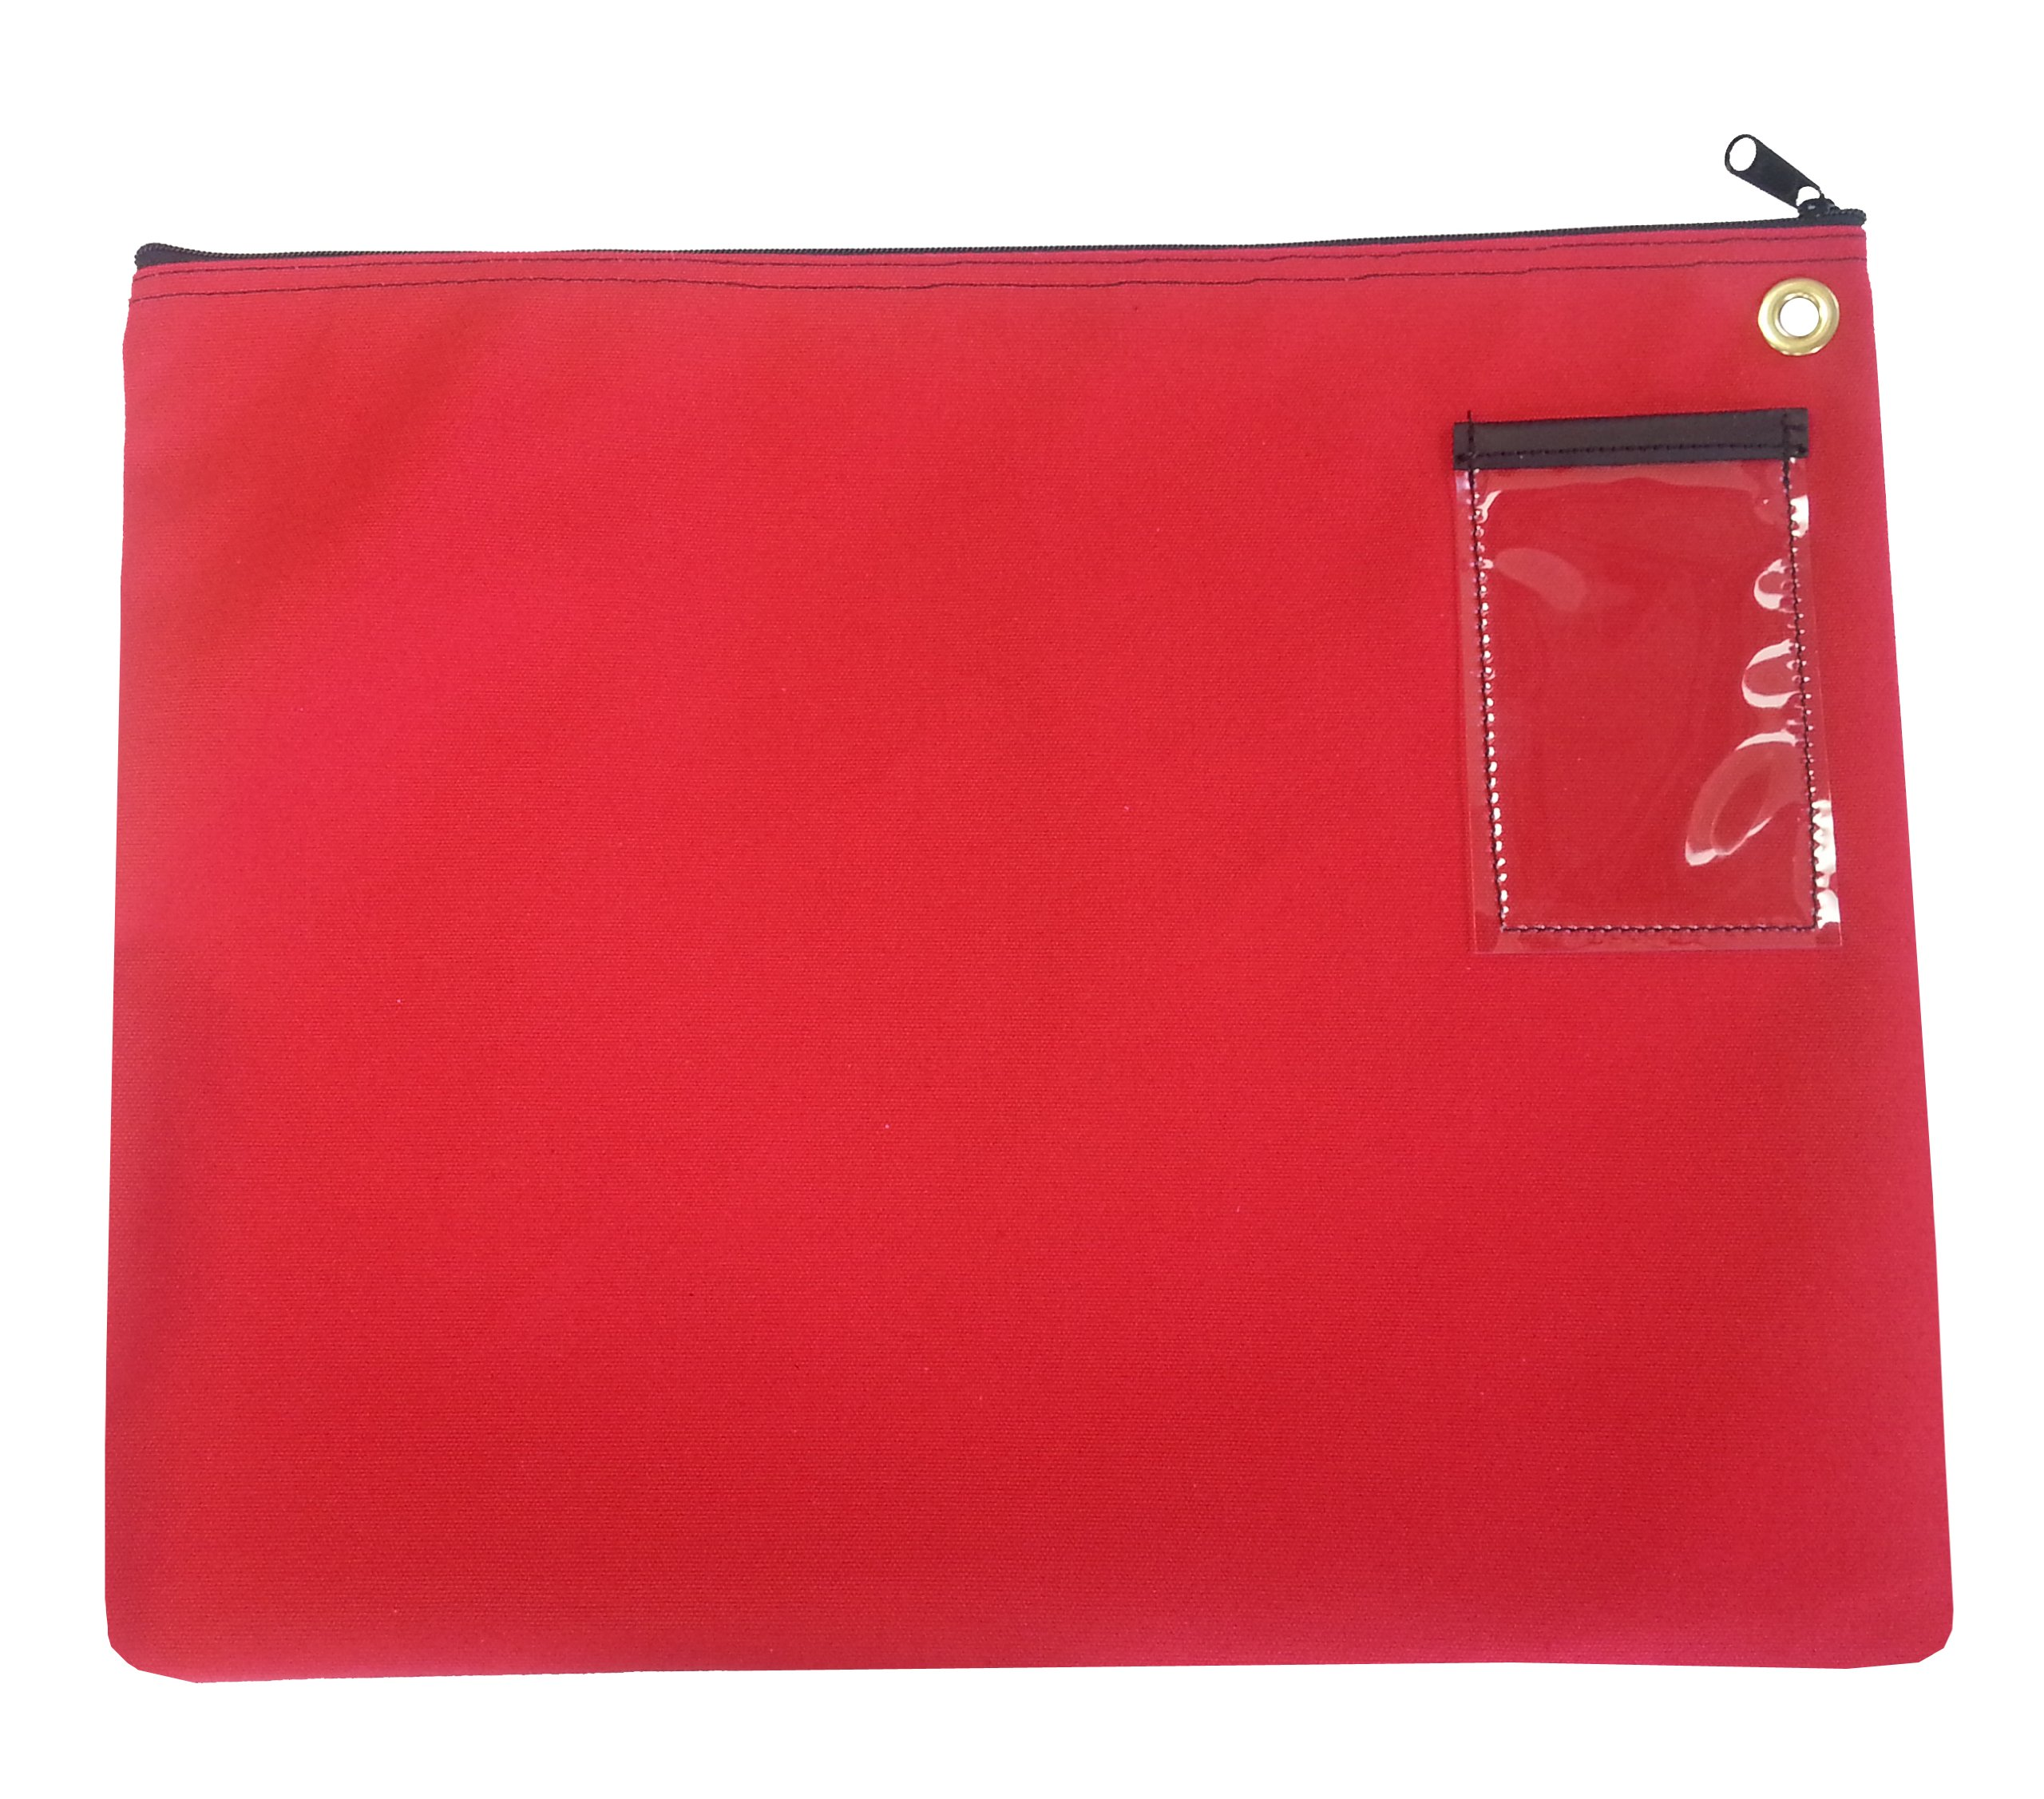 Interoffice Mailer Canvas Transit Sack Zipper Bag 18w x 14h Red